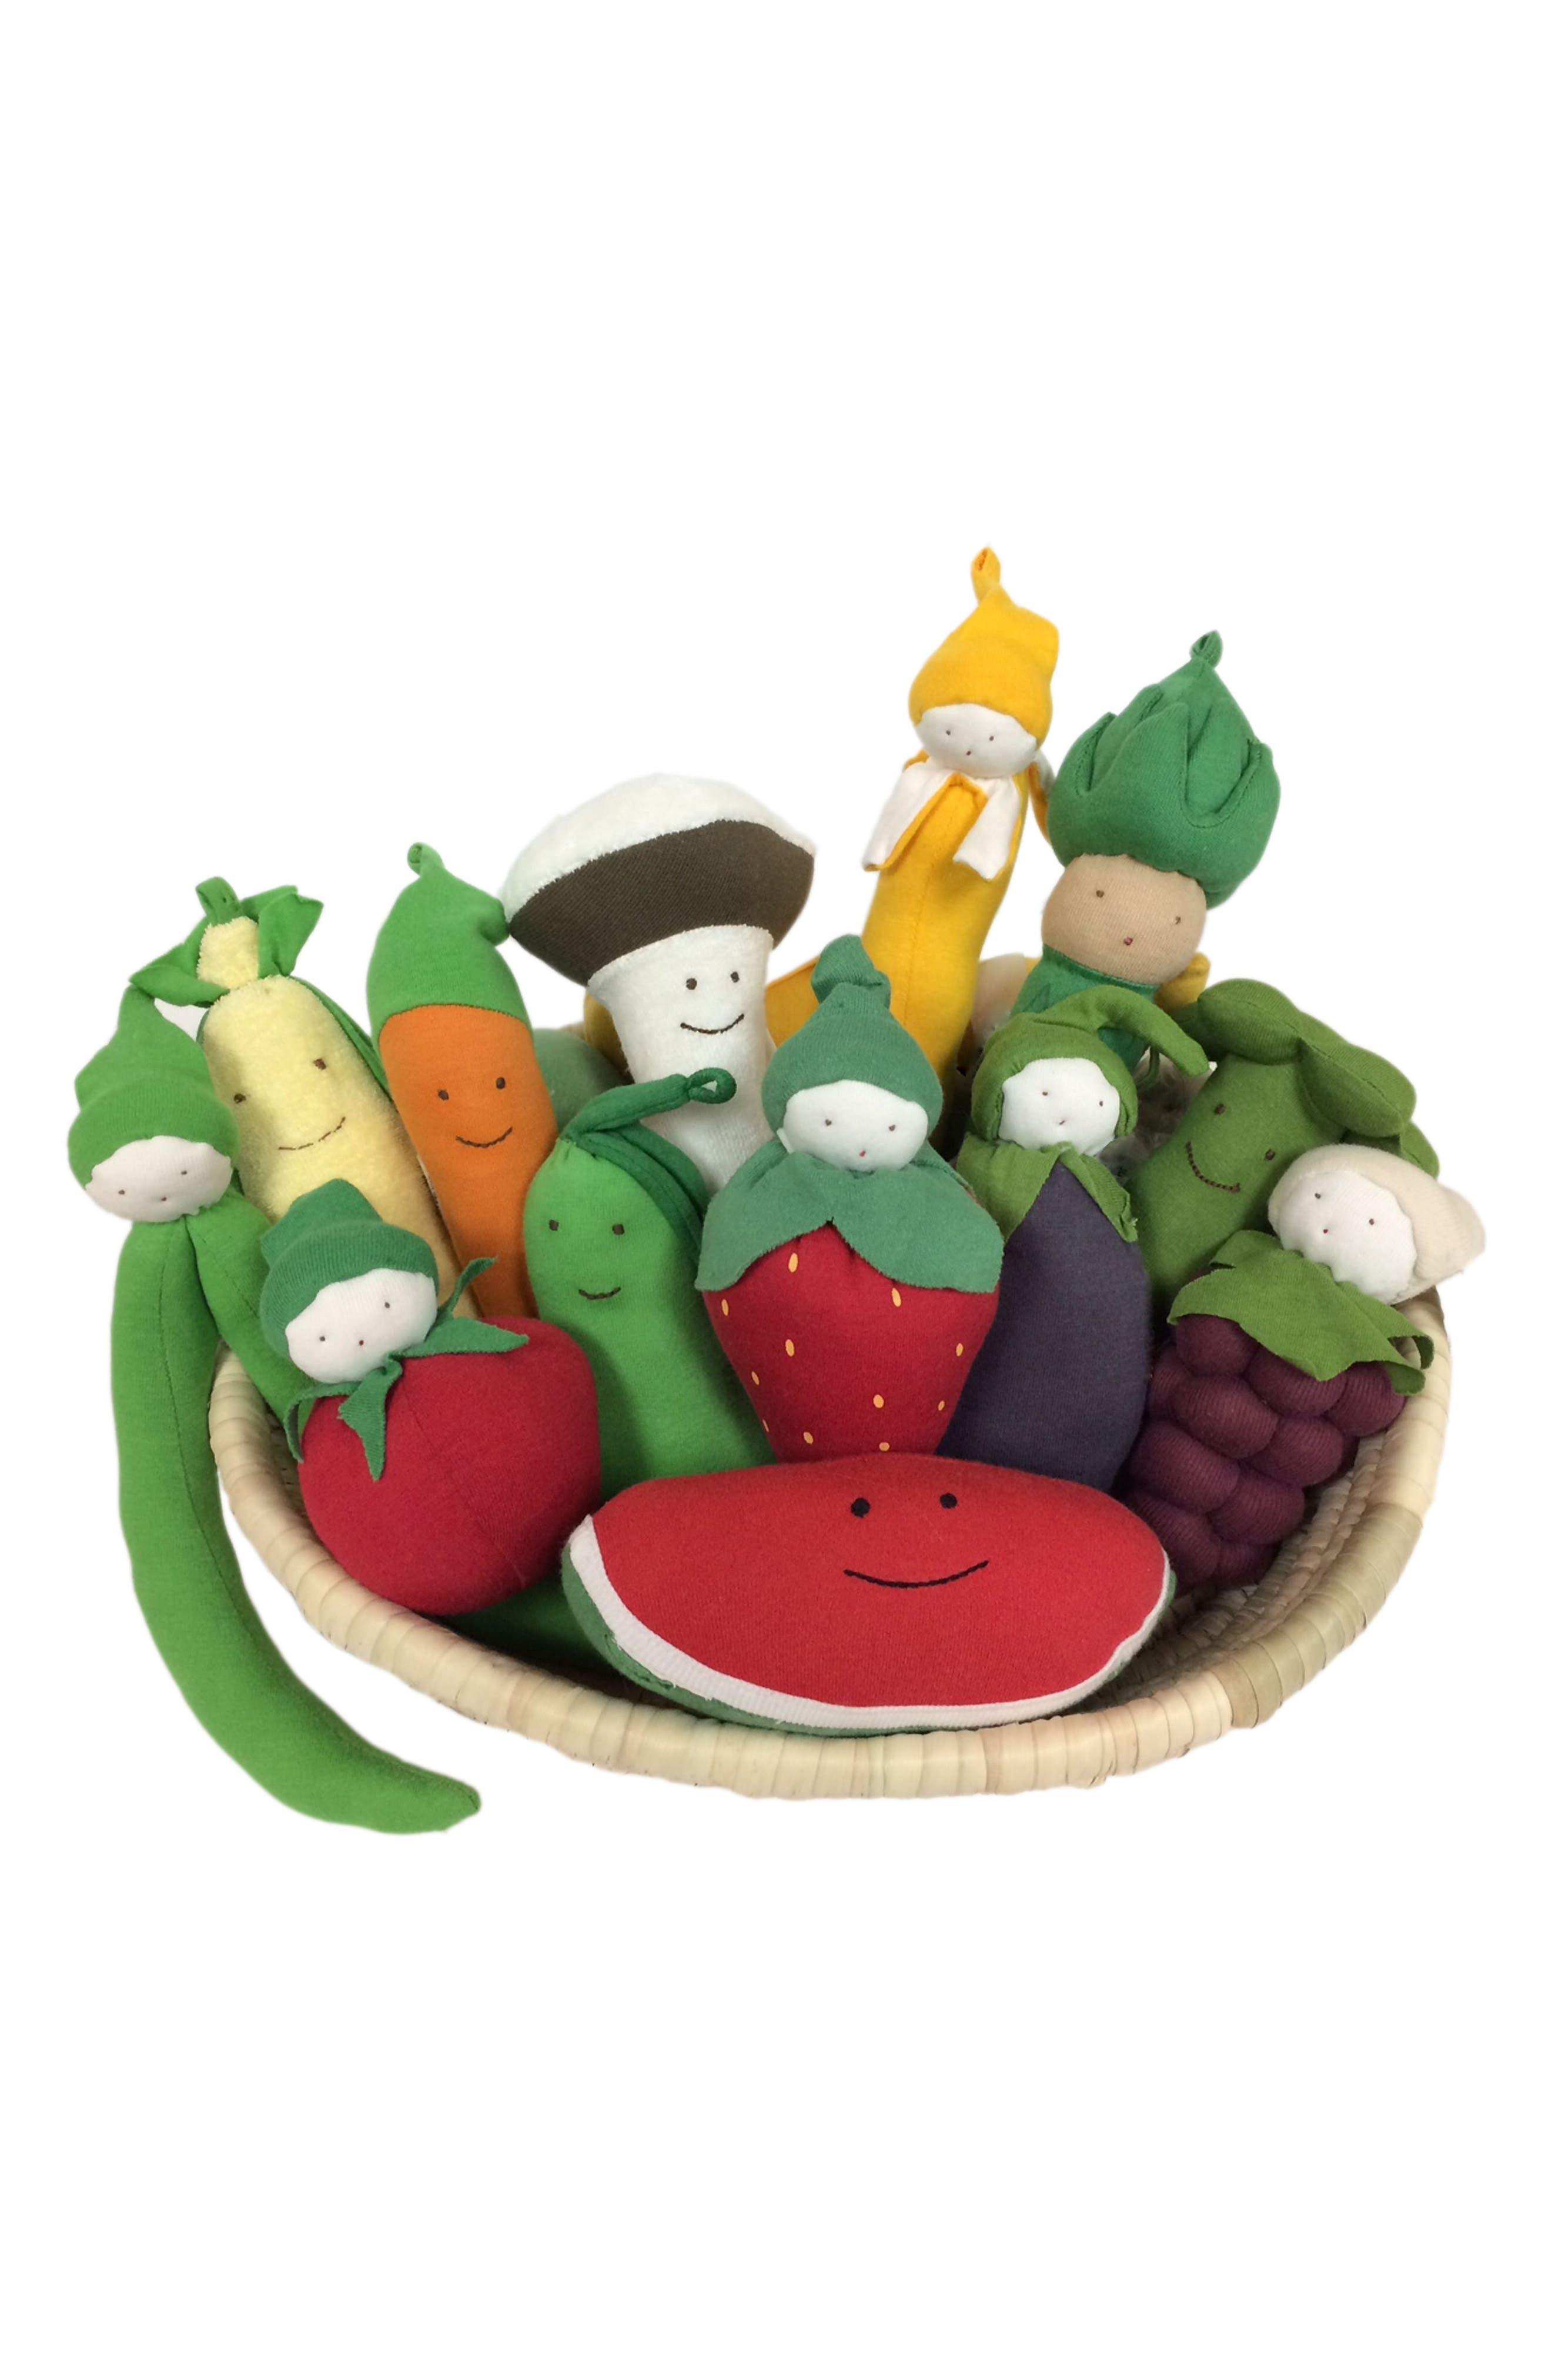 Under the Nile 14-Piece Stuffed Fruit & Vegetable Basket